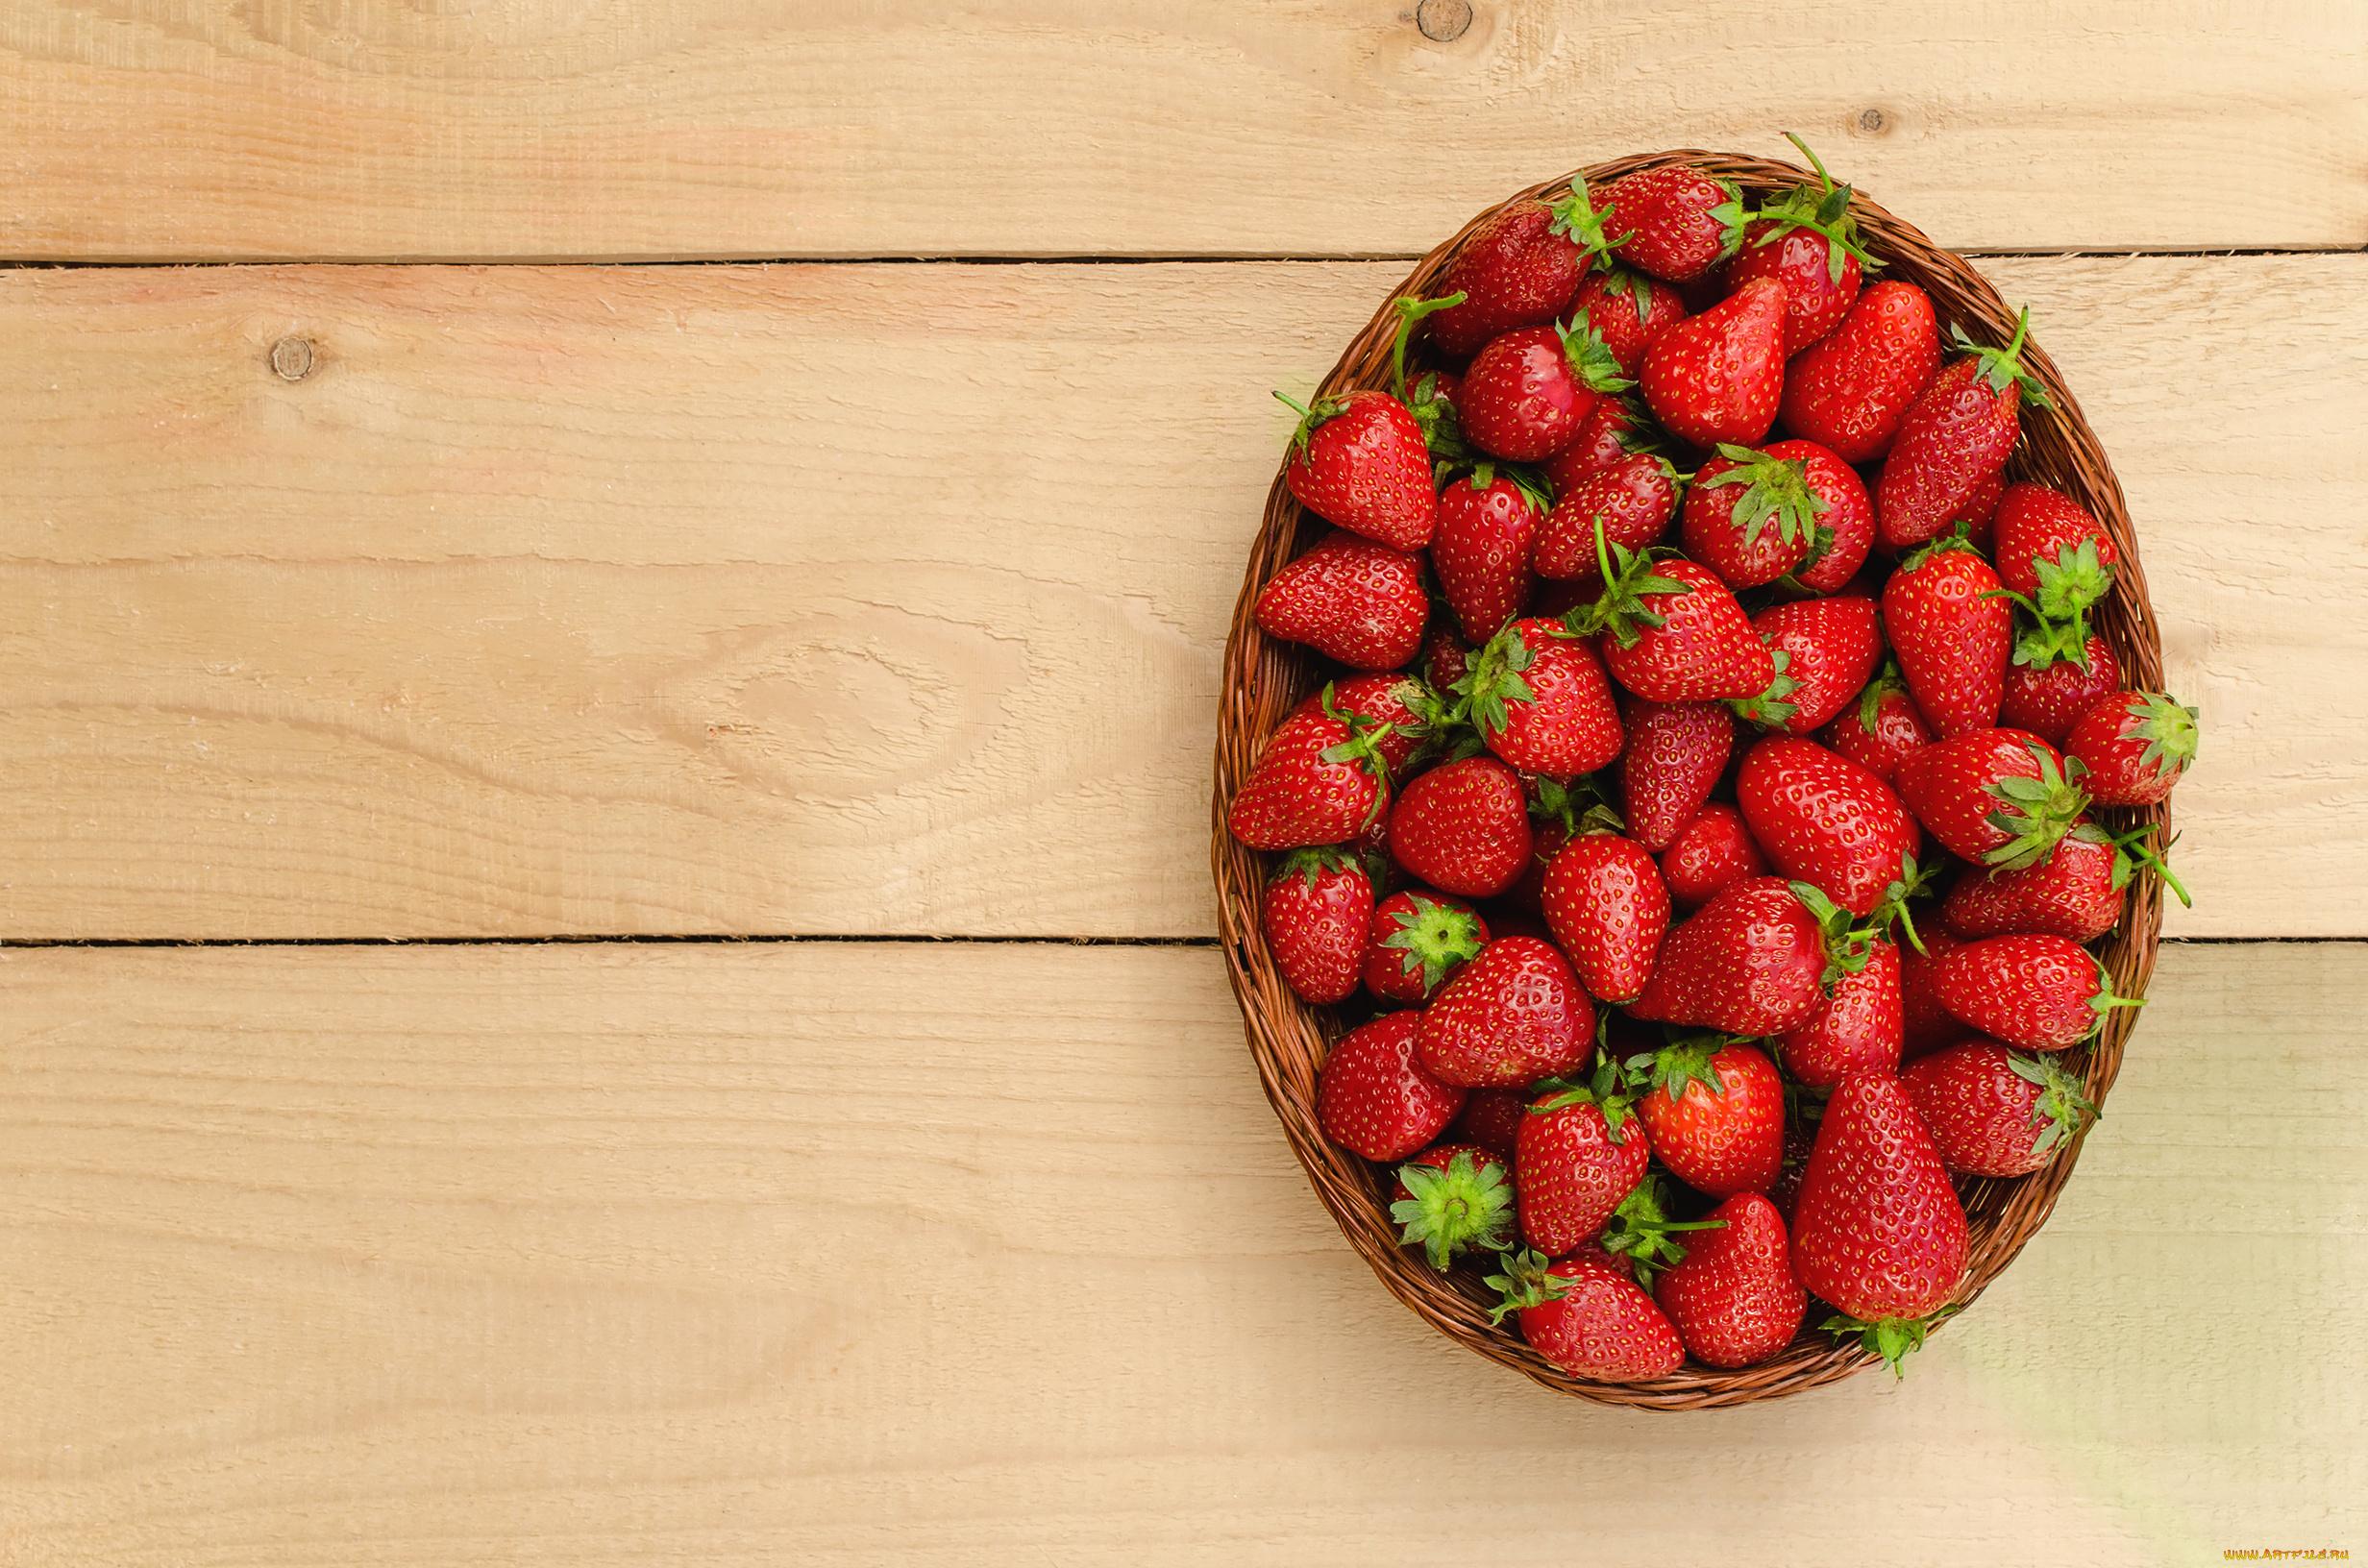 клубника корзина strawberry basket загрузить